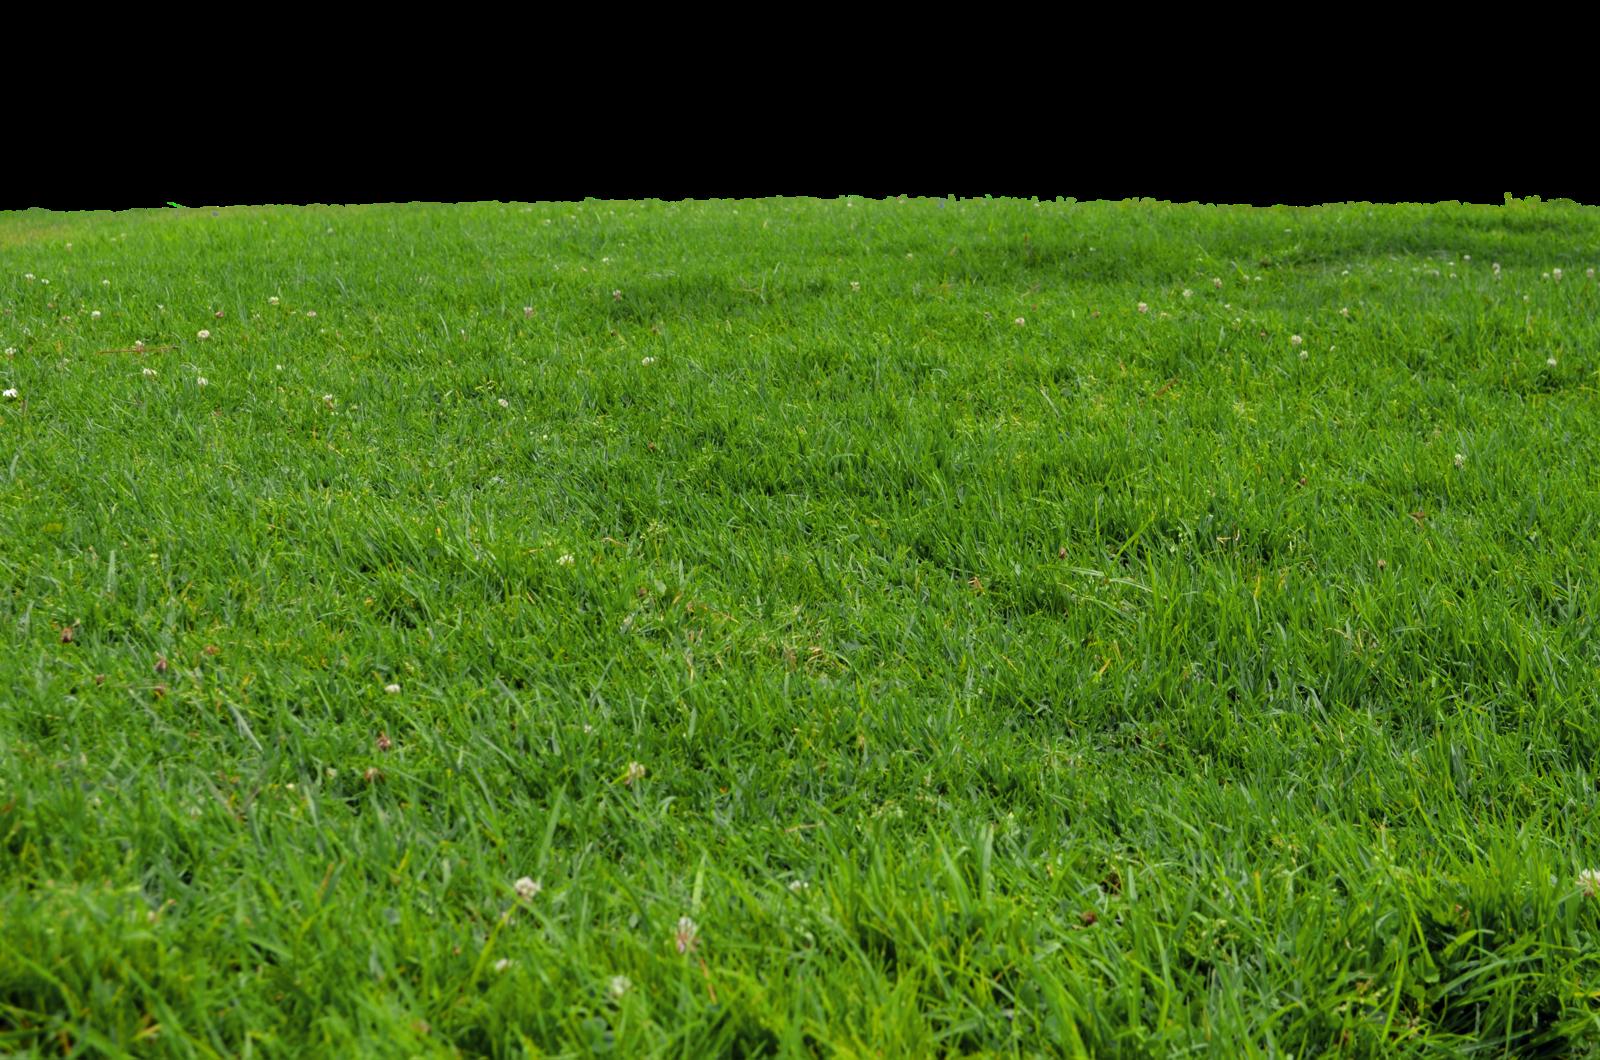 Grass Realistic Fabric Material Landscape Benartex 100/% Cotton New Last Piece